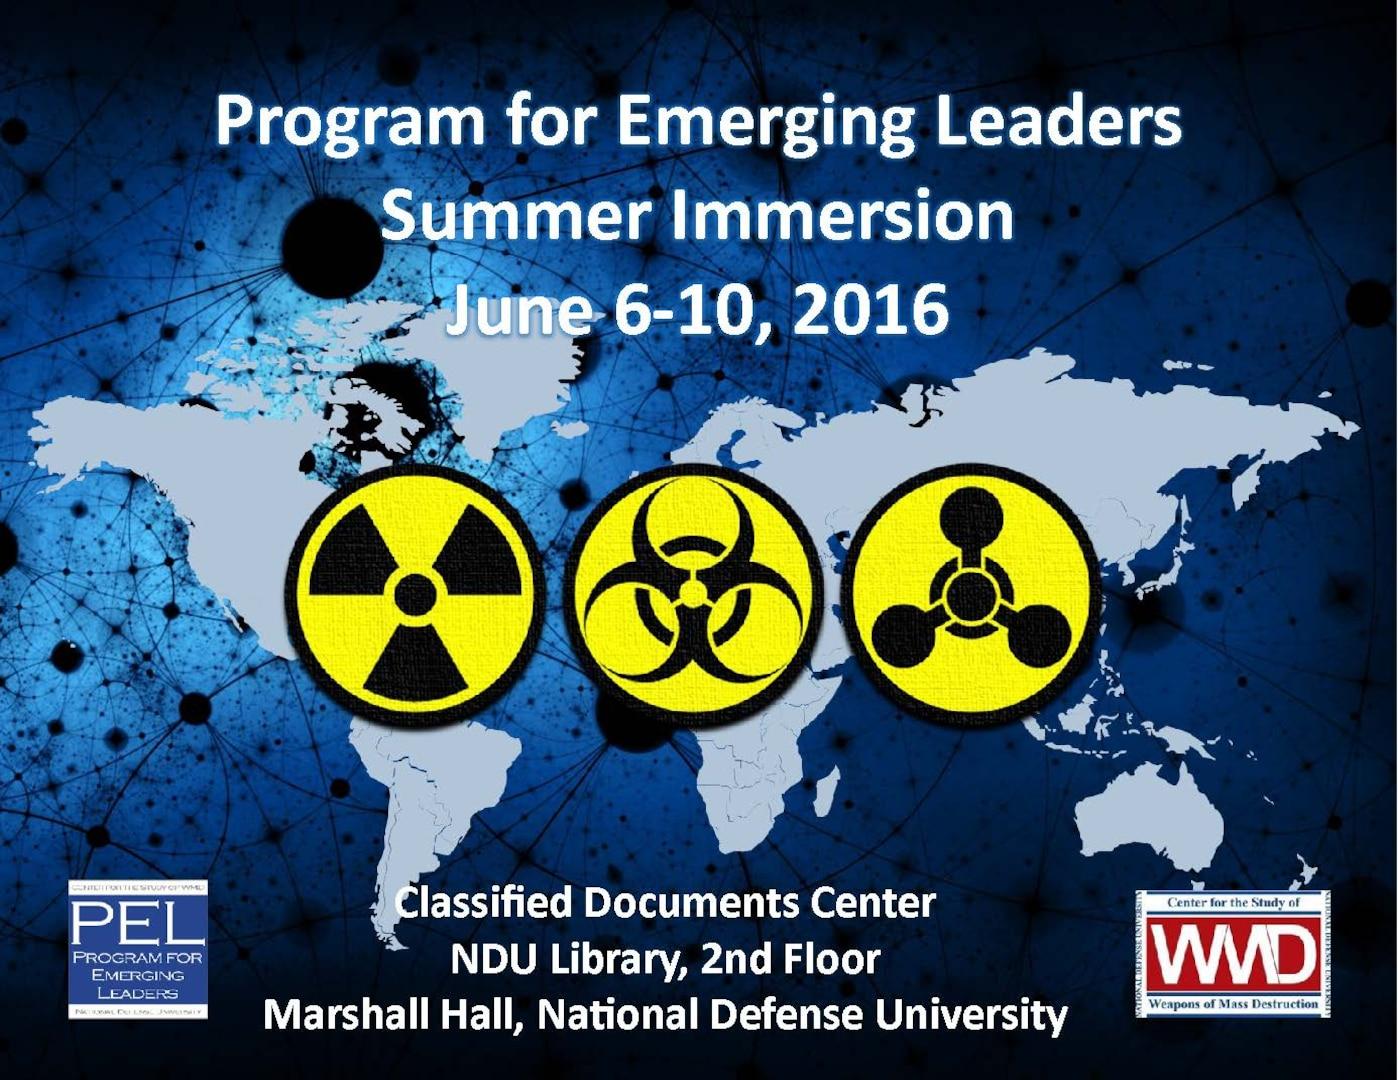 Poster for Program for Emerging Leaders Summer Immersion 2018.